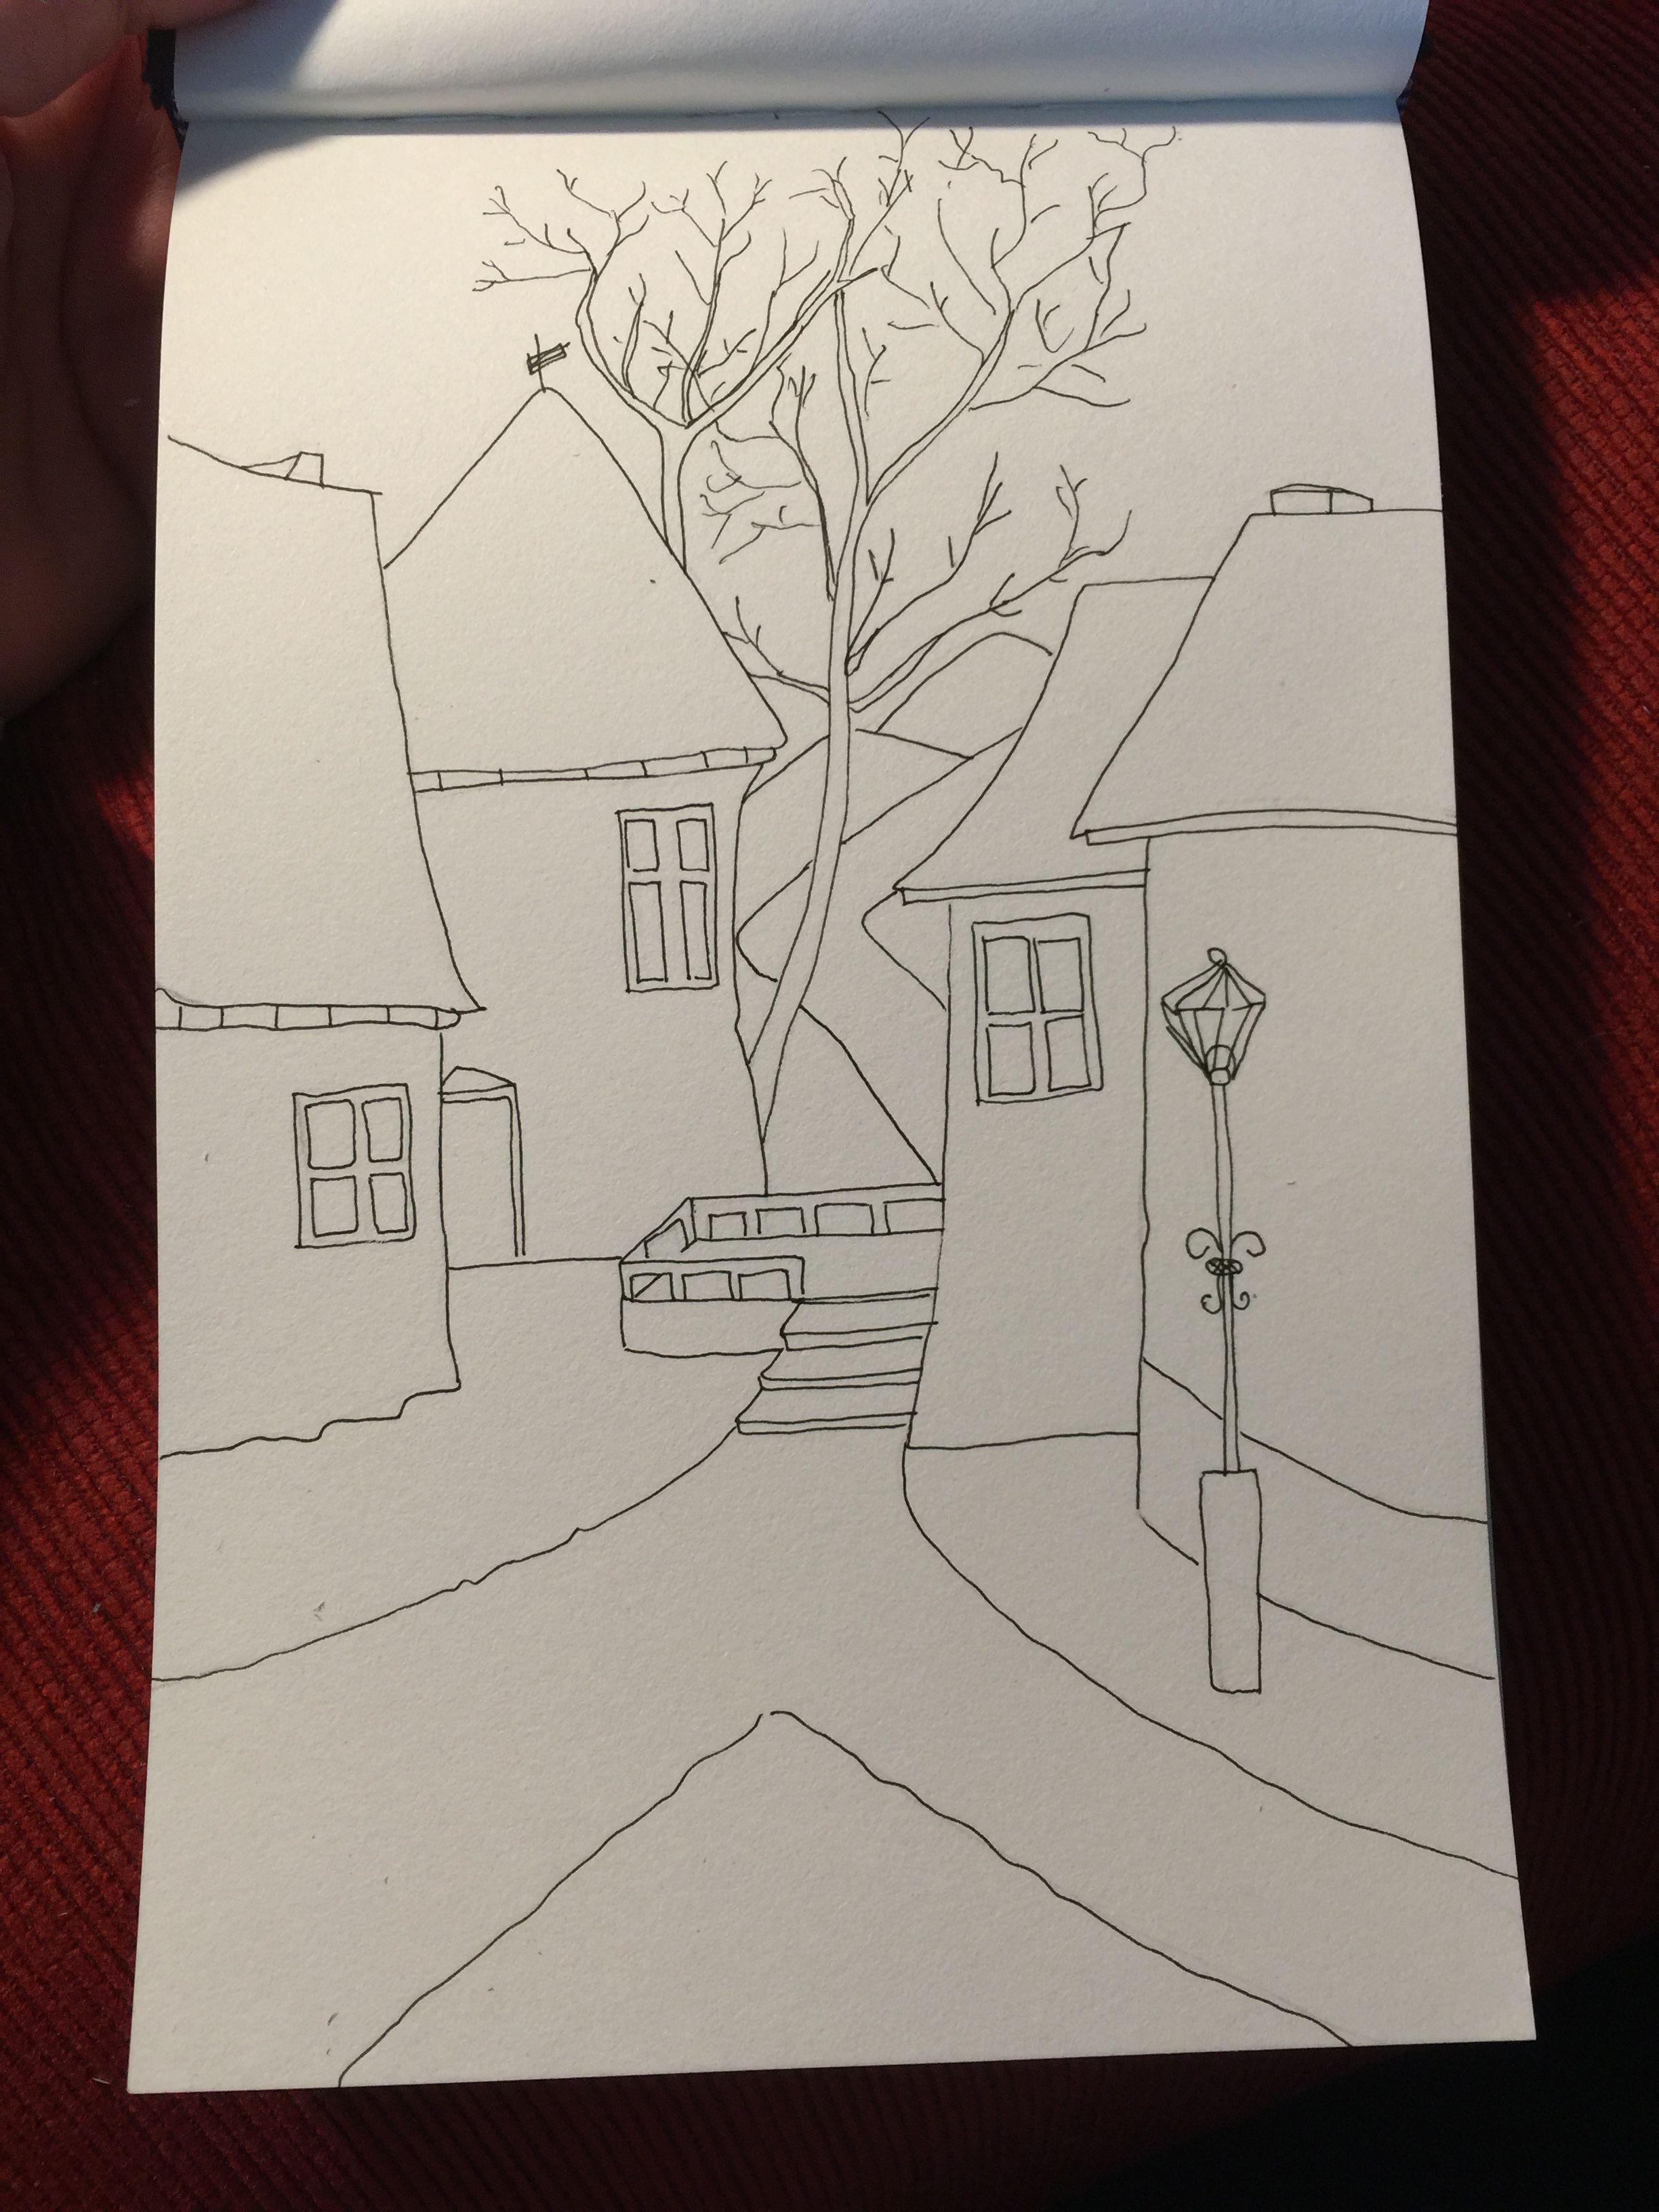 Pin de Little Miss Sparkle * en Drawing | Pinterest | Dibujar ...